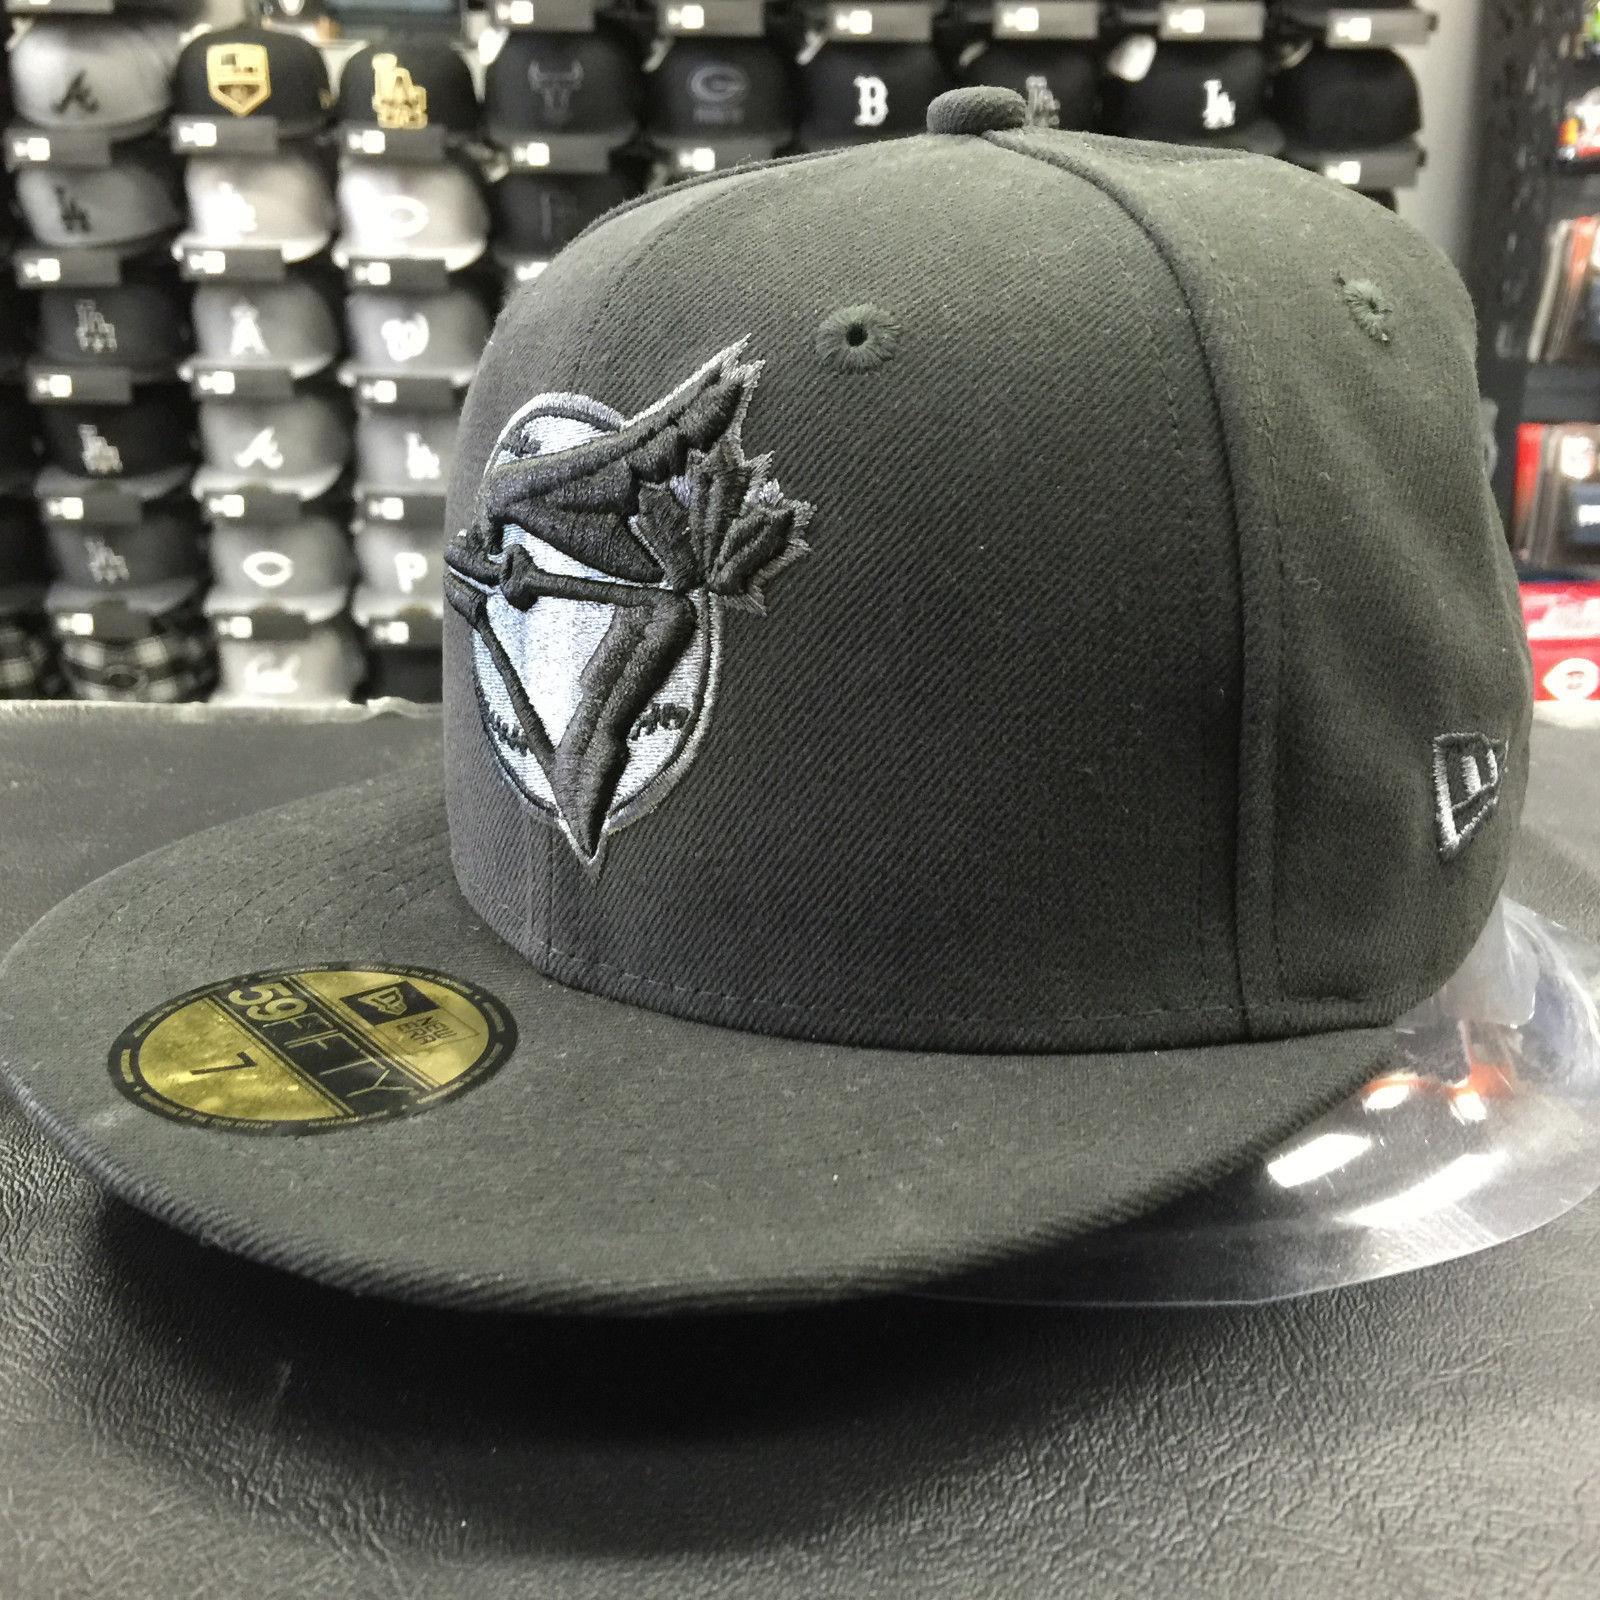 New Era 59Fifty MLB Toronto Blue Jays Black Gray Basic Fitted Cap